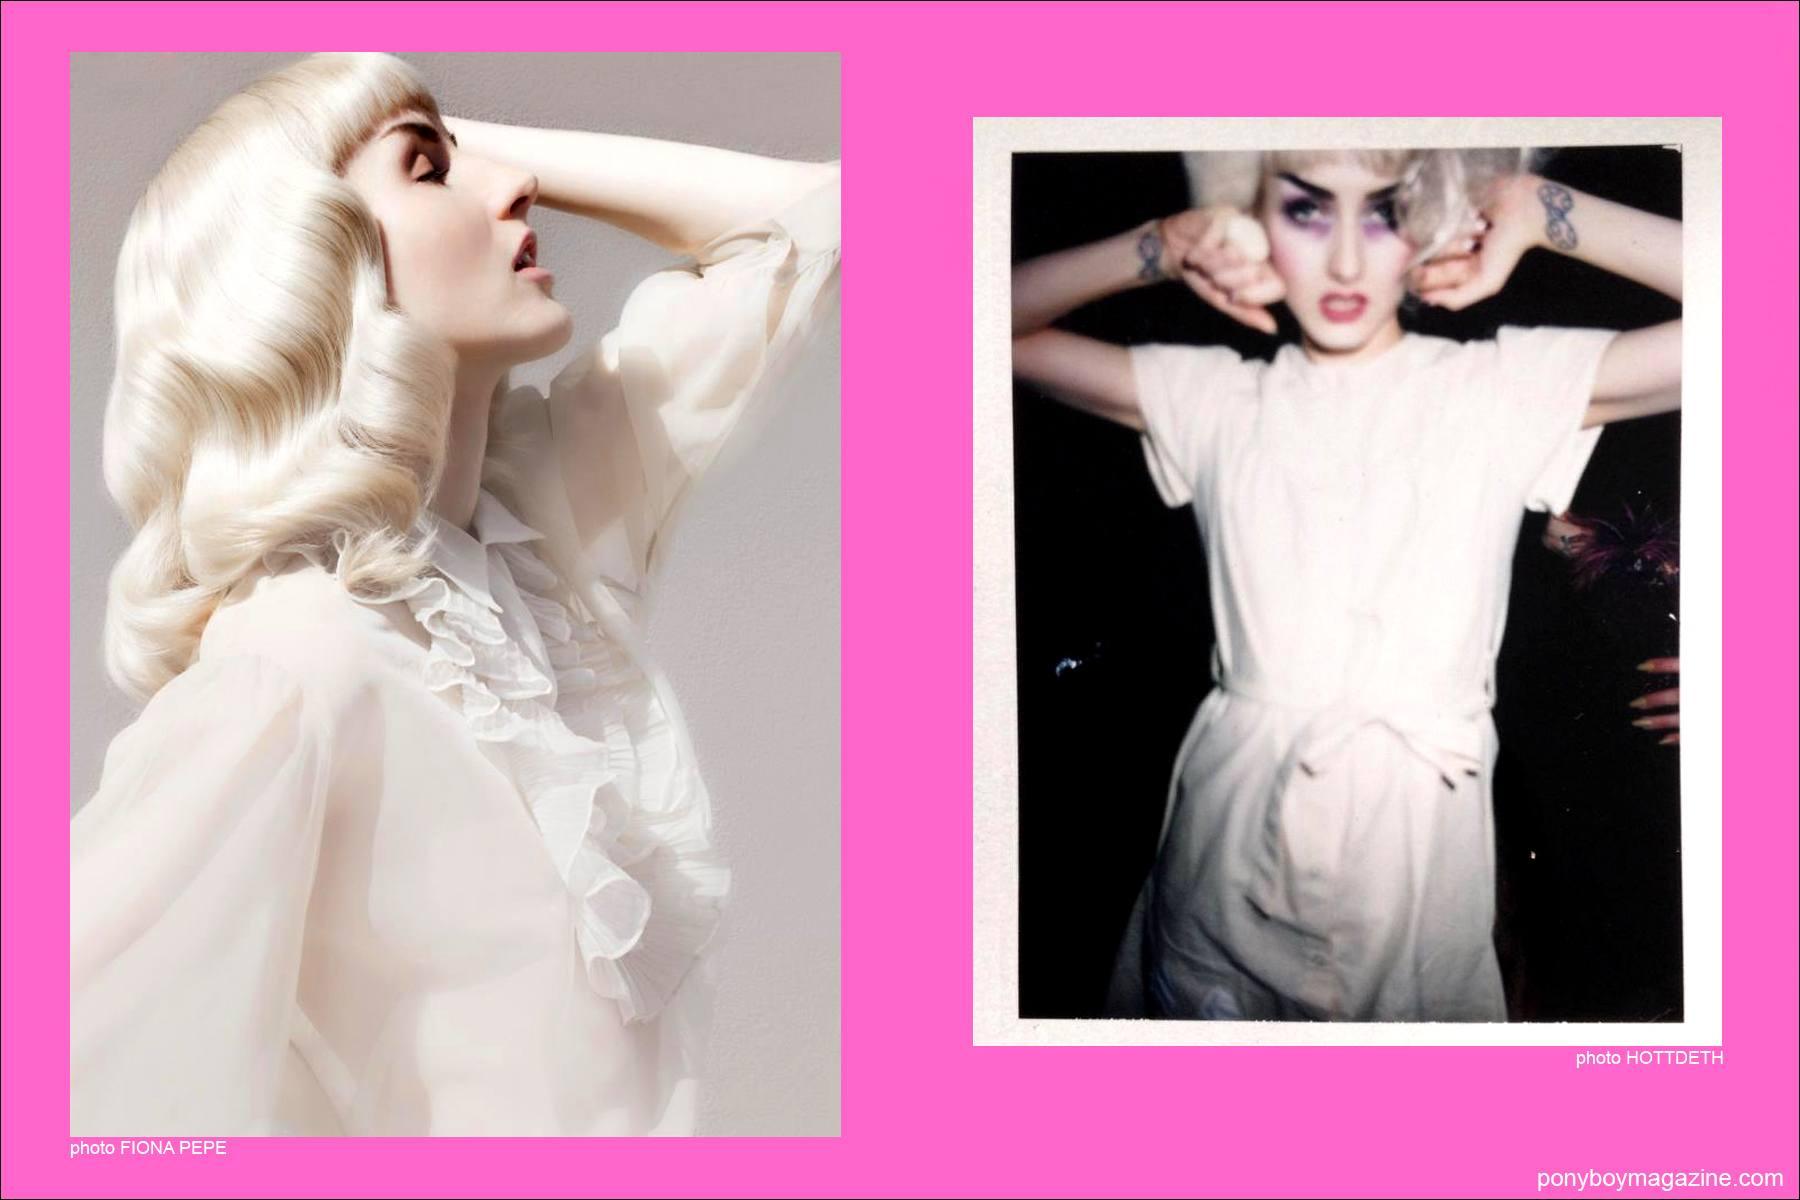 More modeling photos of edgy New York City model Stella Rose Saint Clair for Ponyboy Magazine.